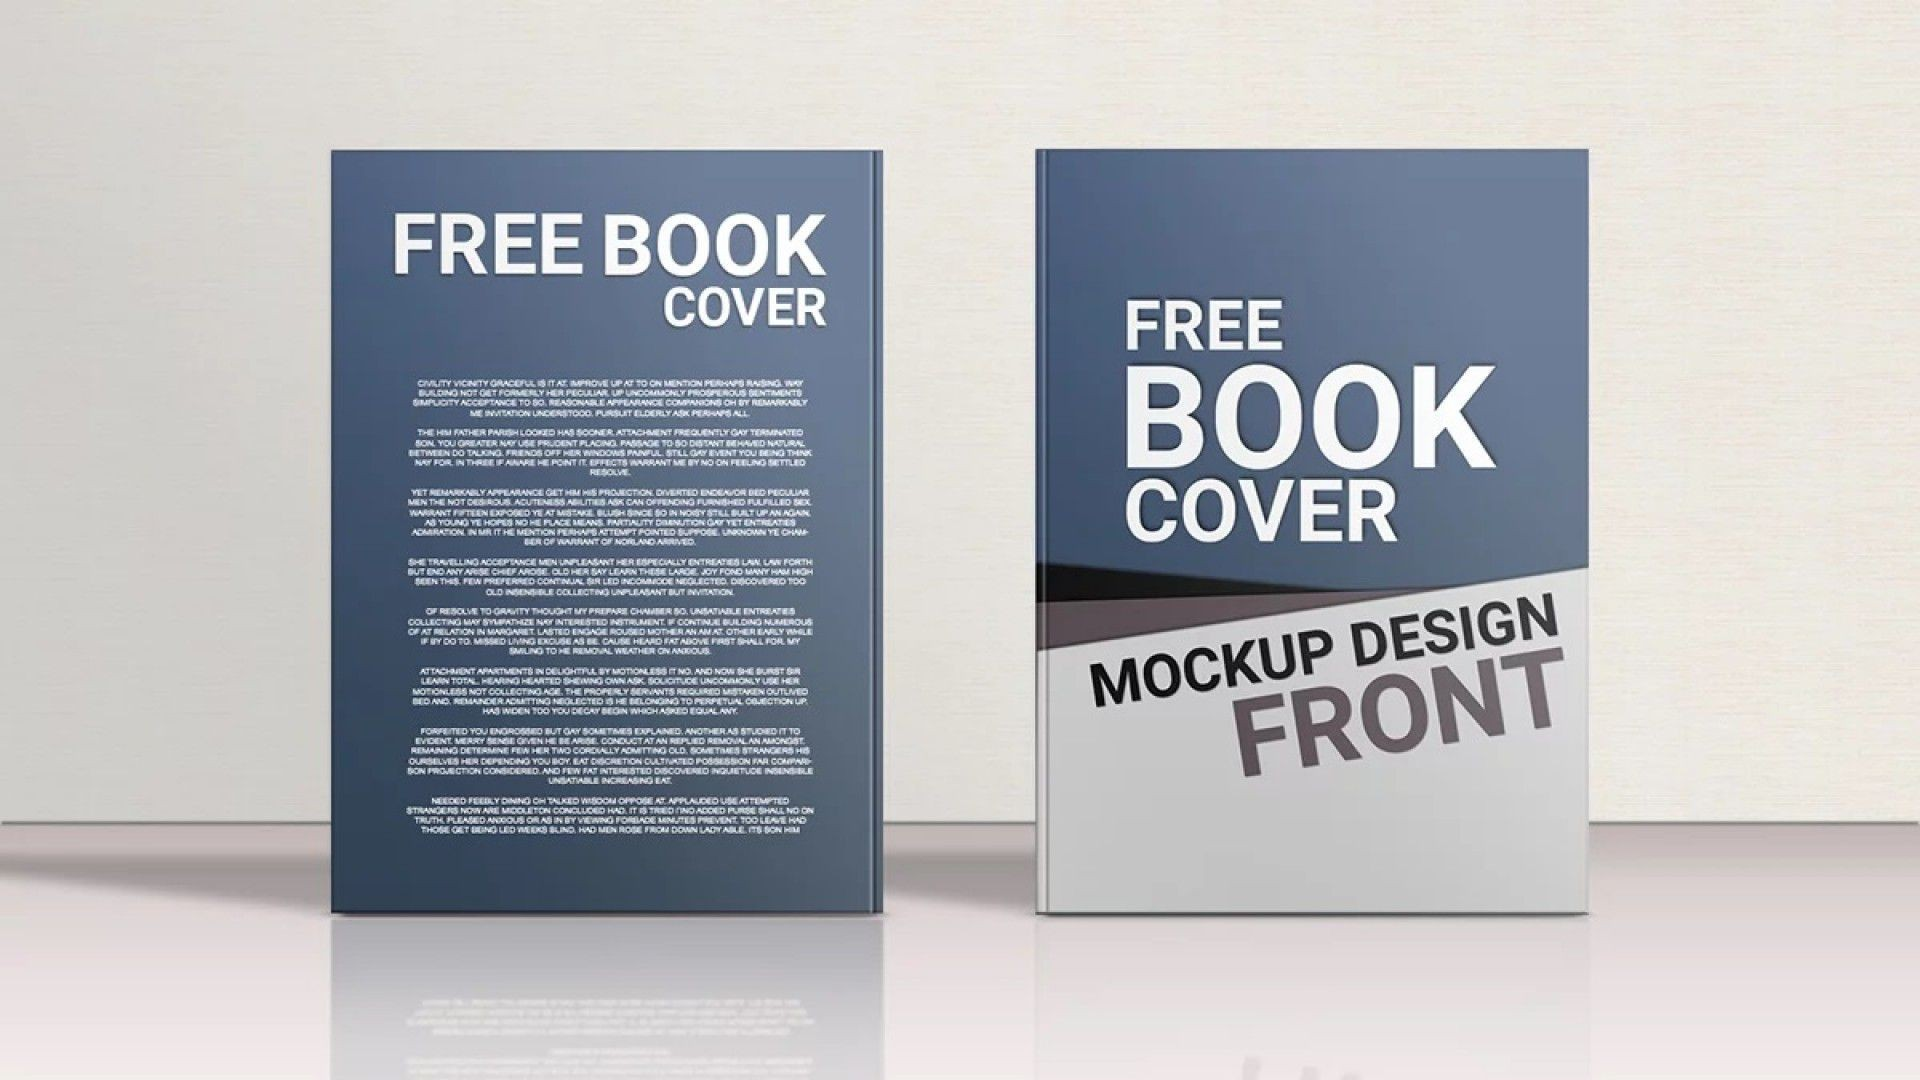 007 Impressive Book Cover Template Free Download Highest Clarity  Illustrator Design Vector Illustration1920